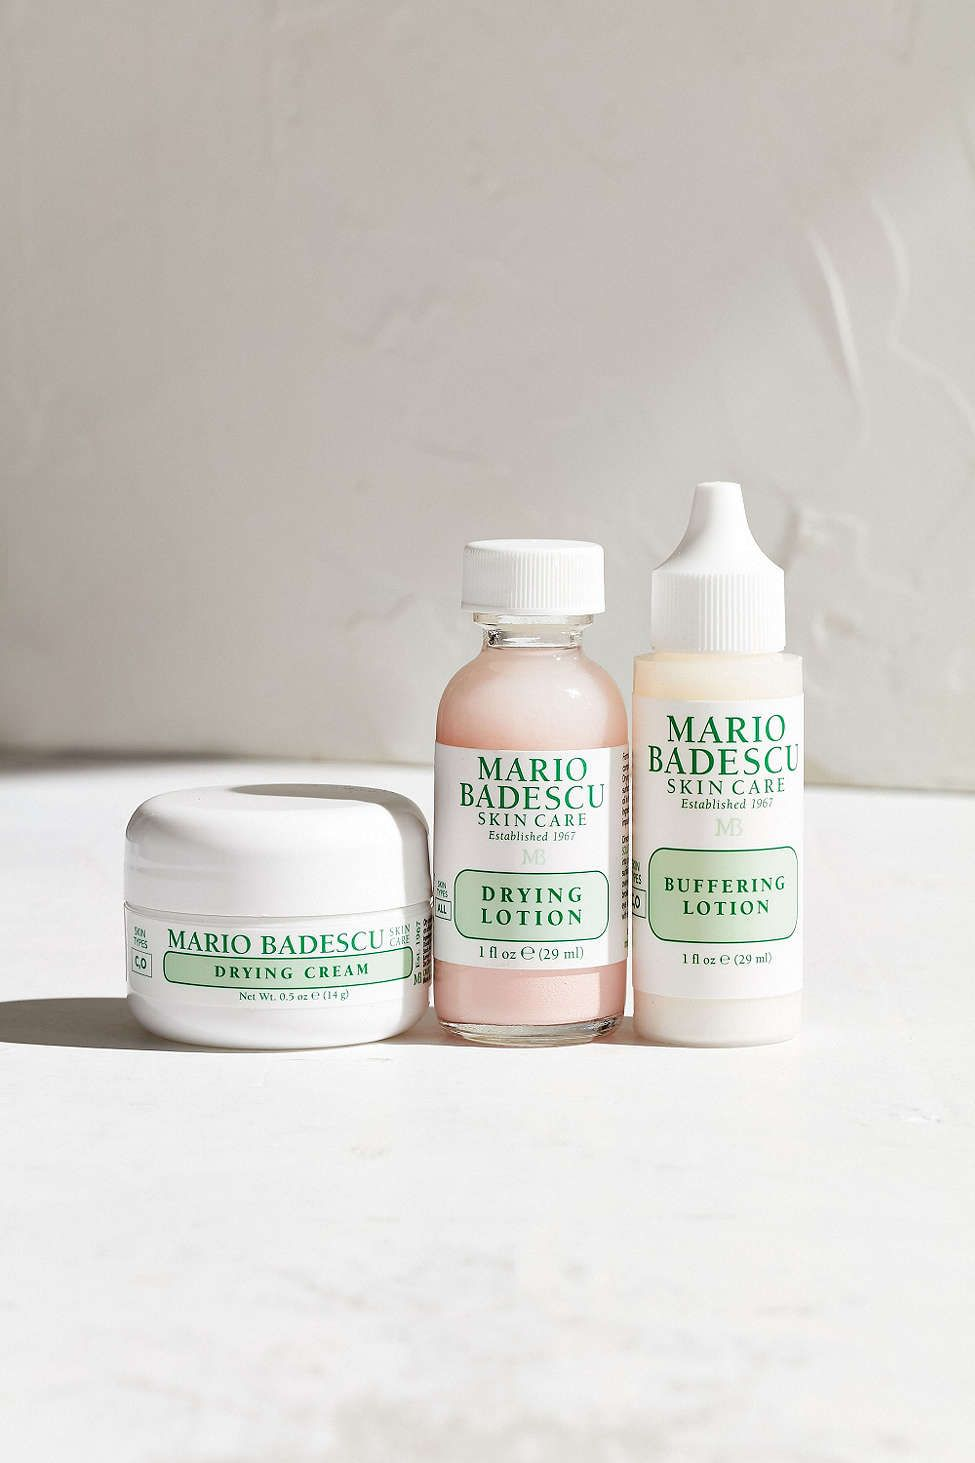 Mario Badescu Acne Repair Kit Acne Prone Skin Acne Treatment